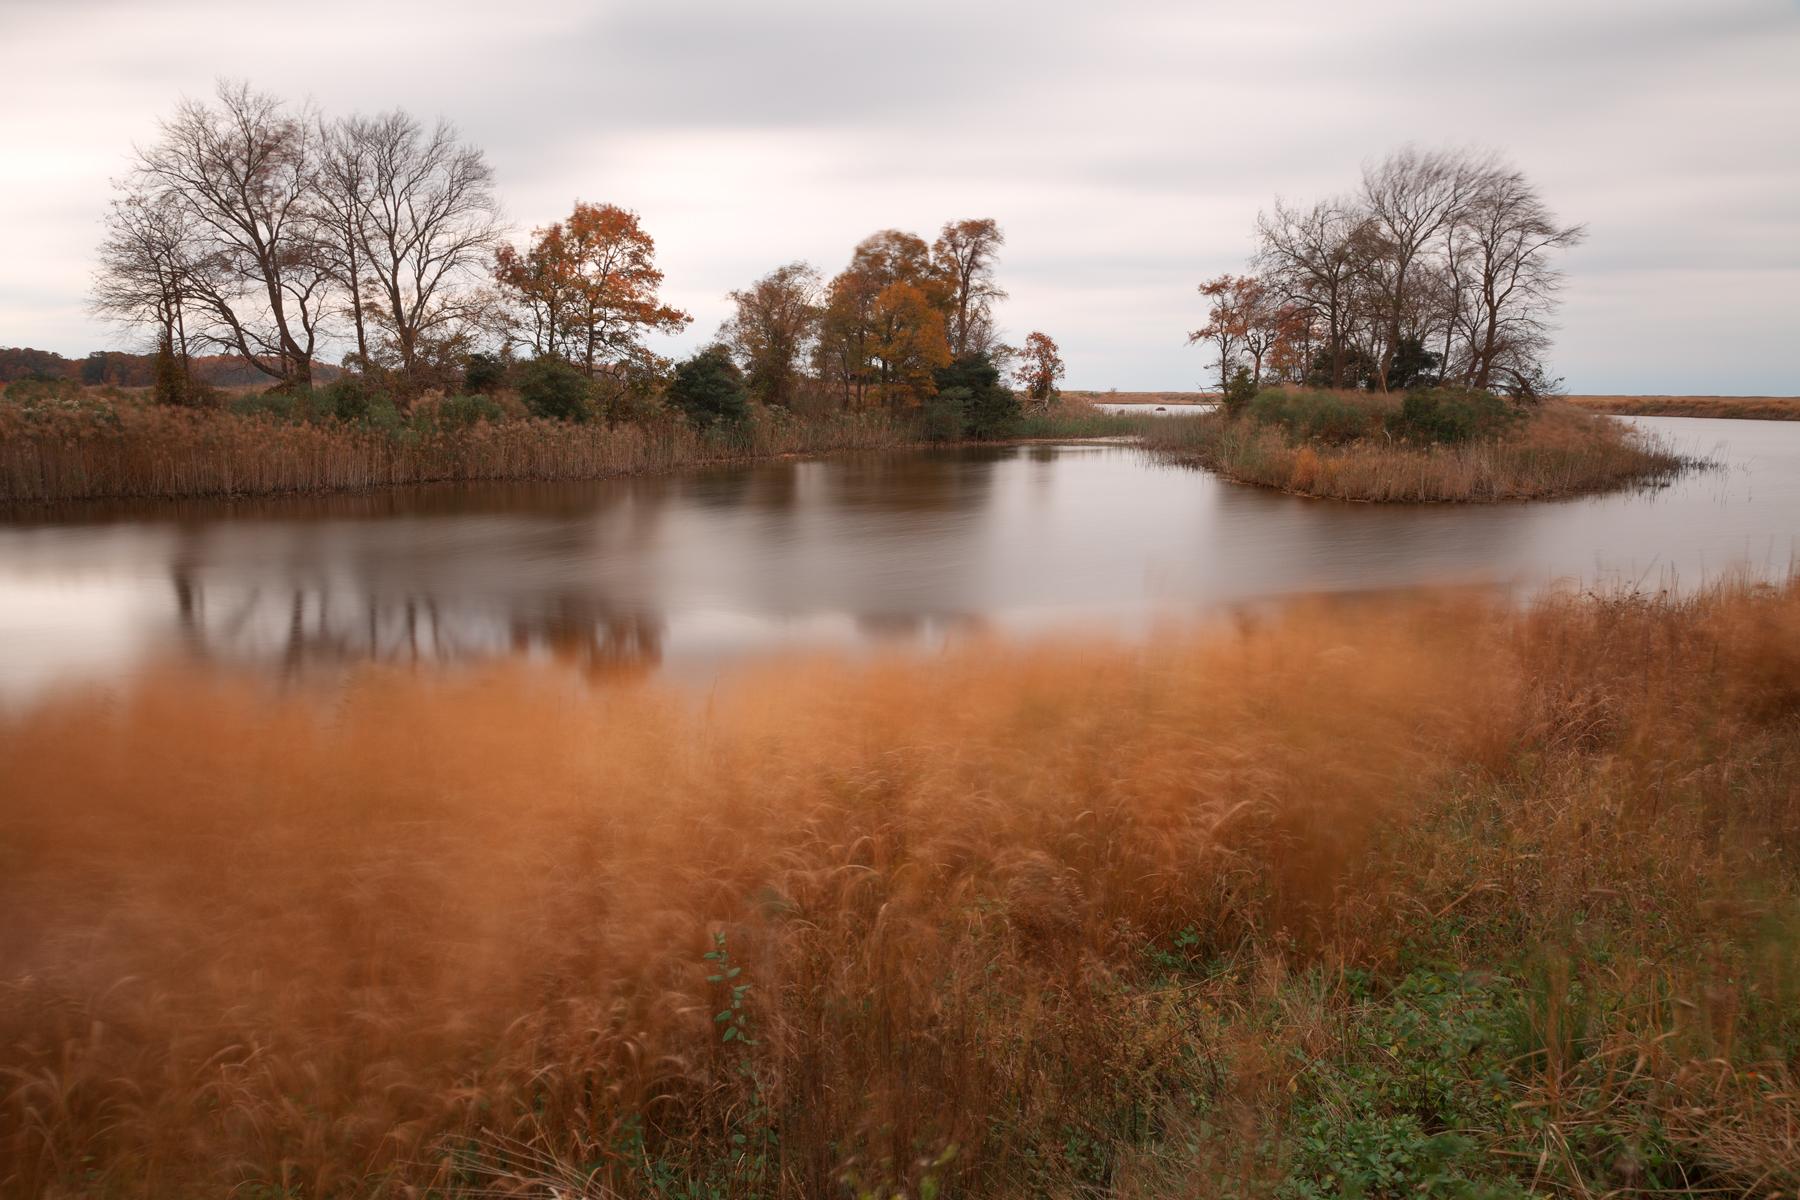 Bear Swamp Pool, America, Serenity, Serene, Seasonal, HQ Photo